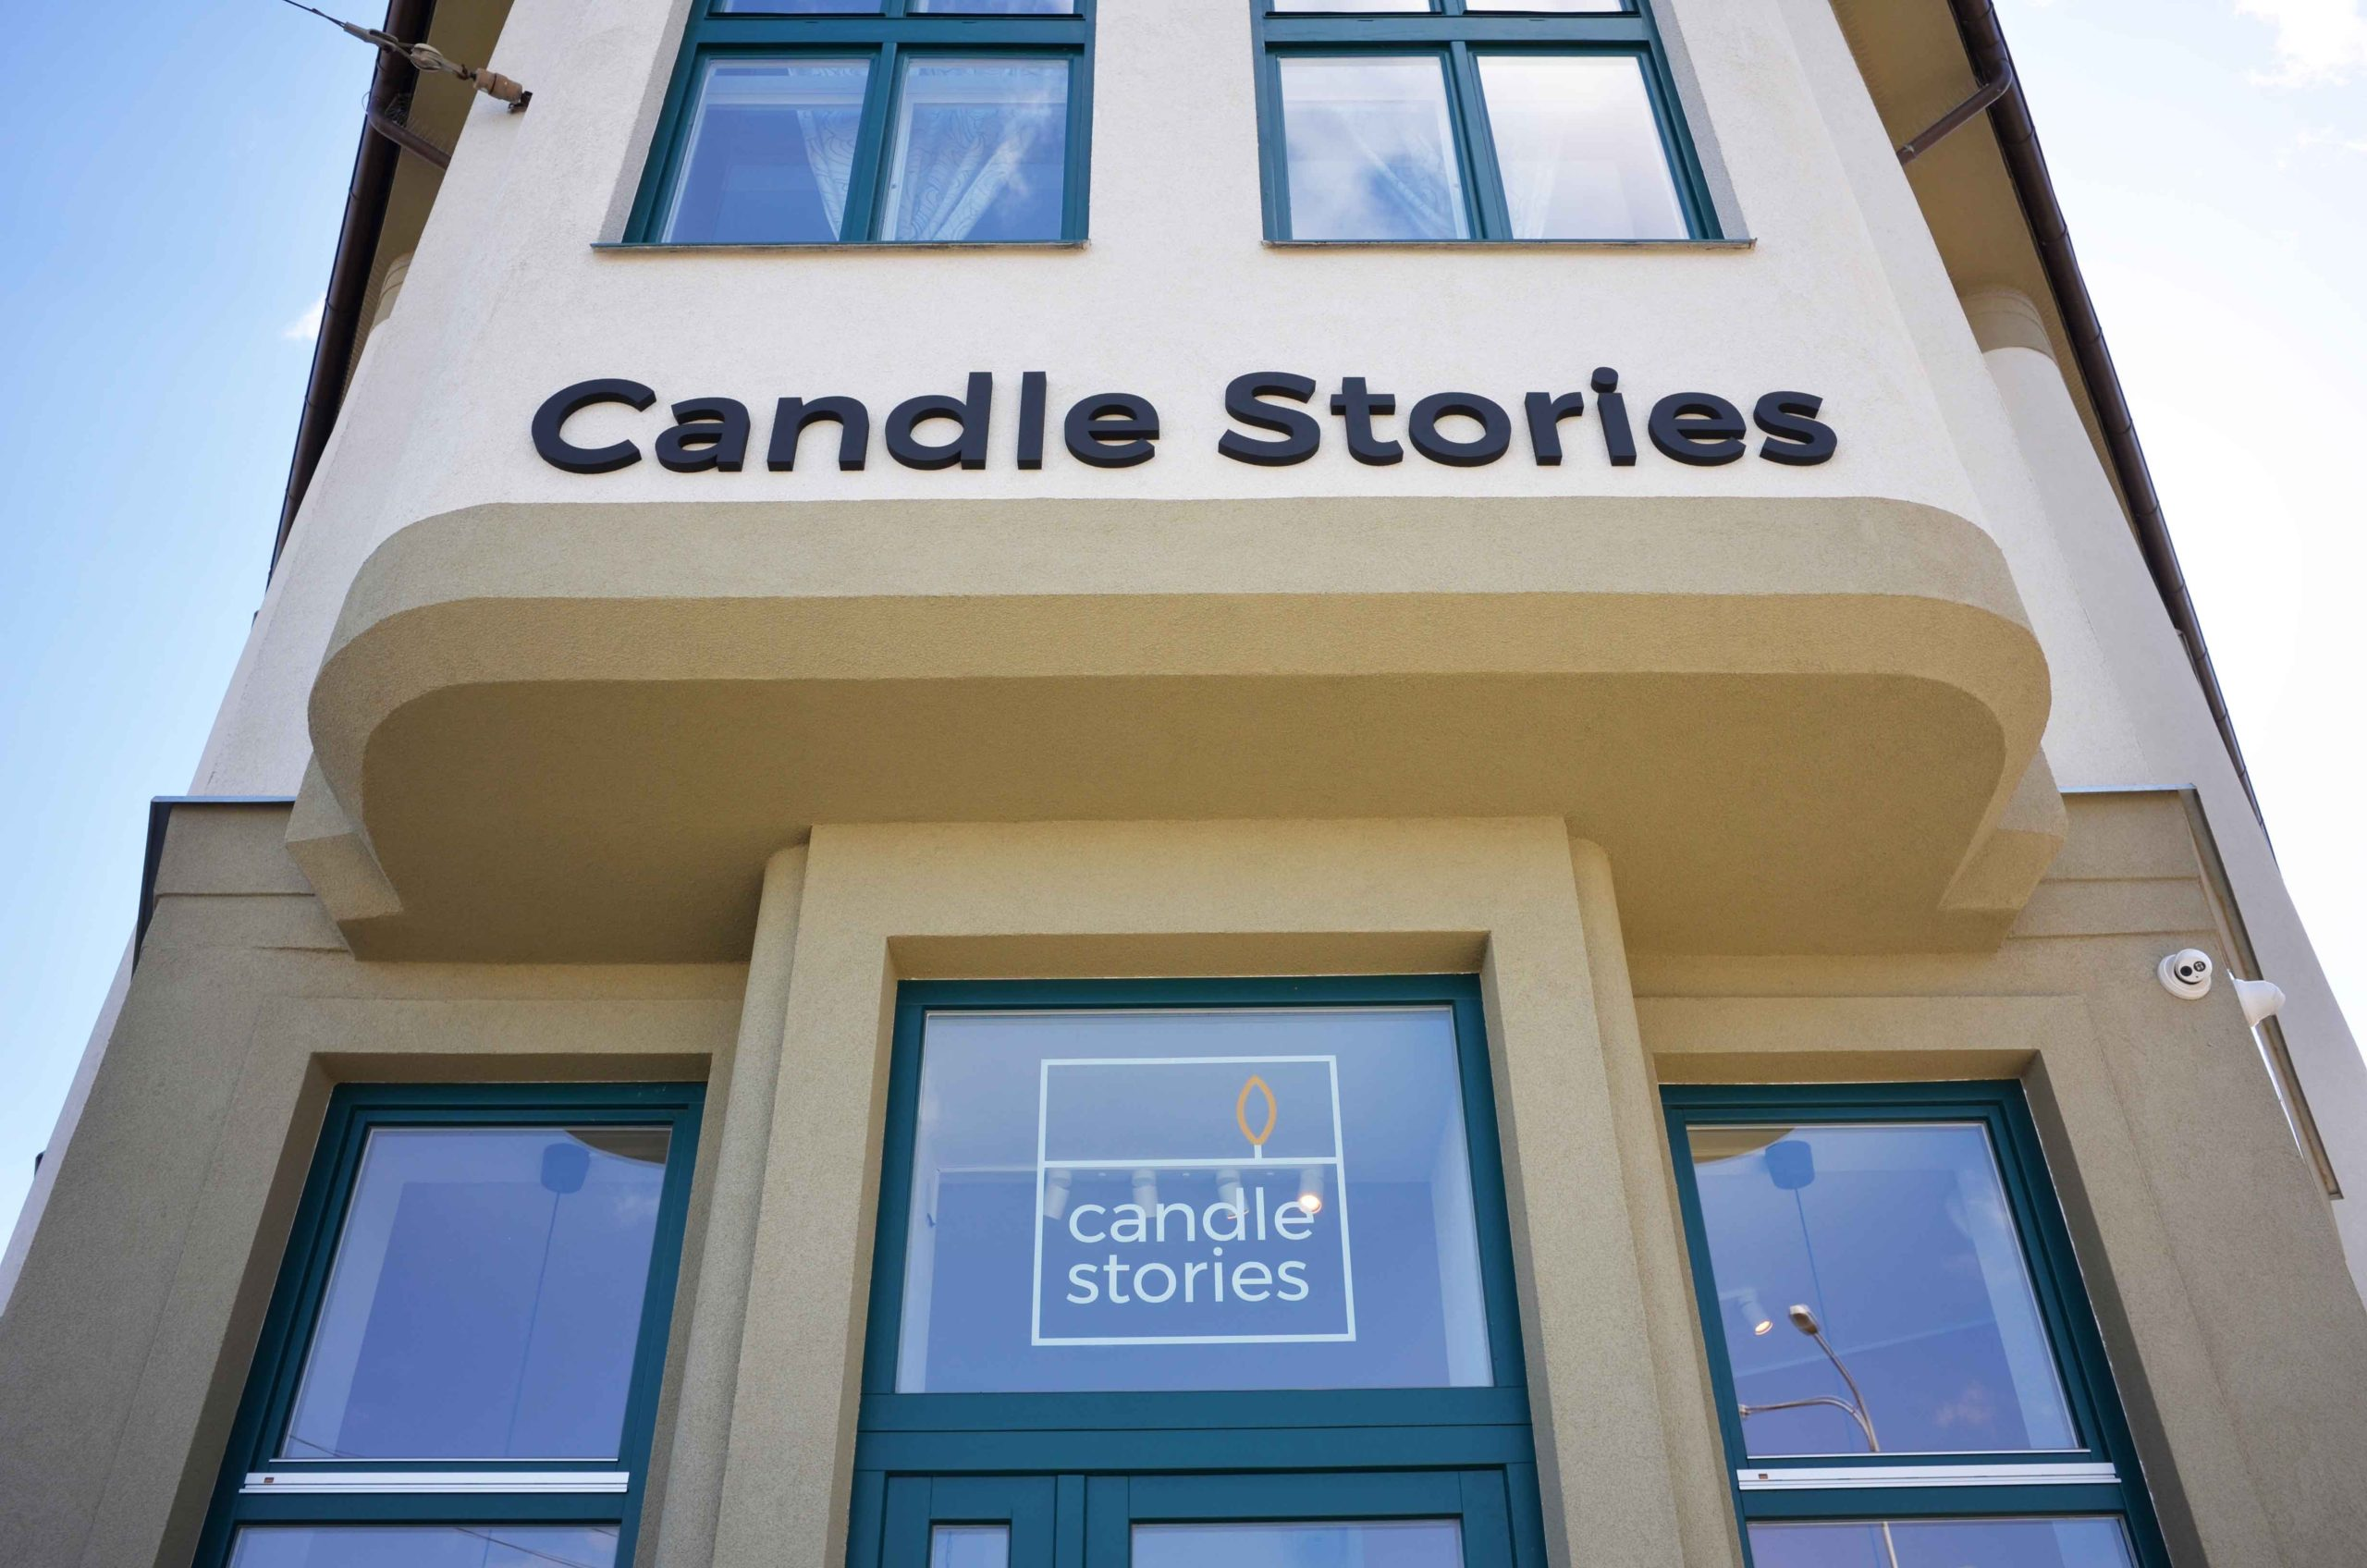 Veronika_Rut_Candle_Stories_design_05